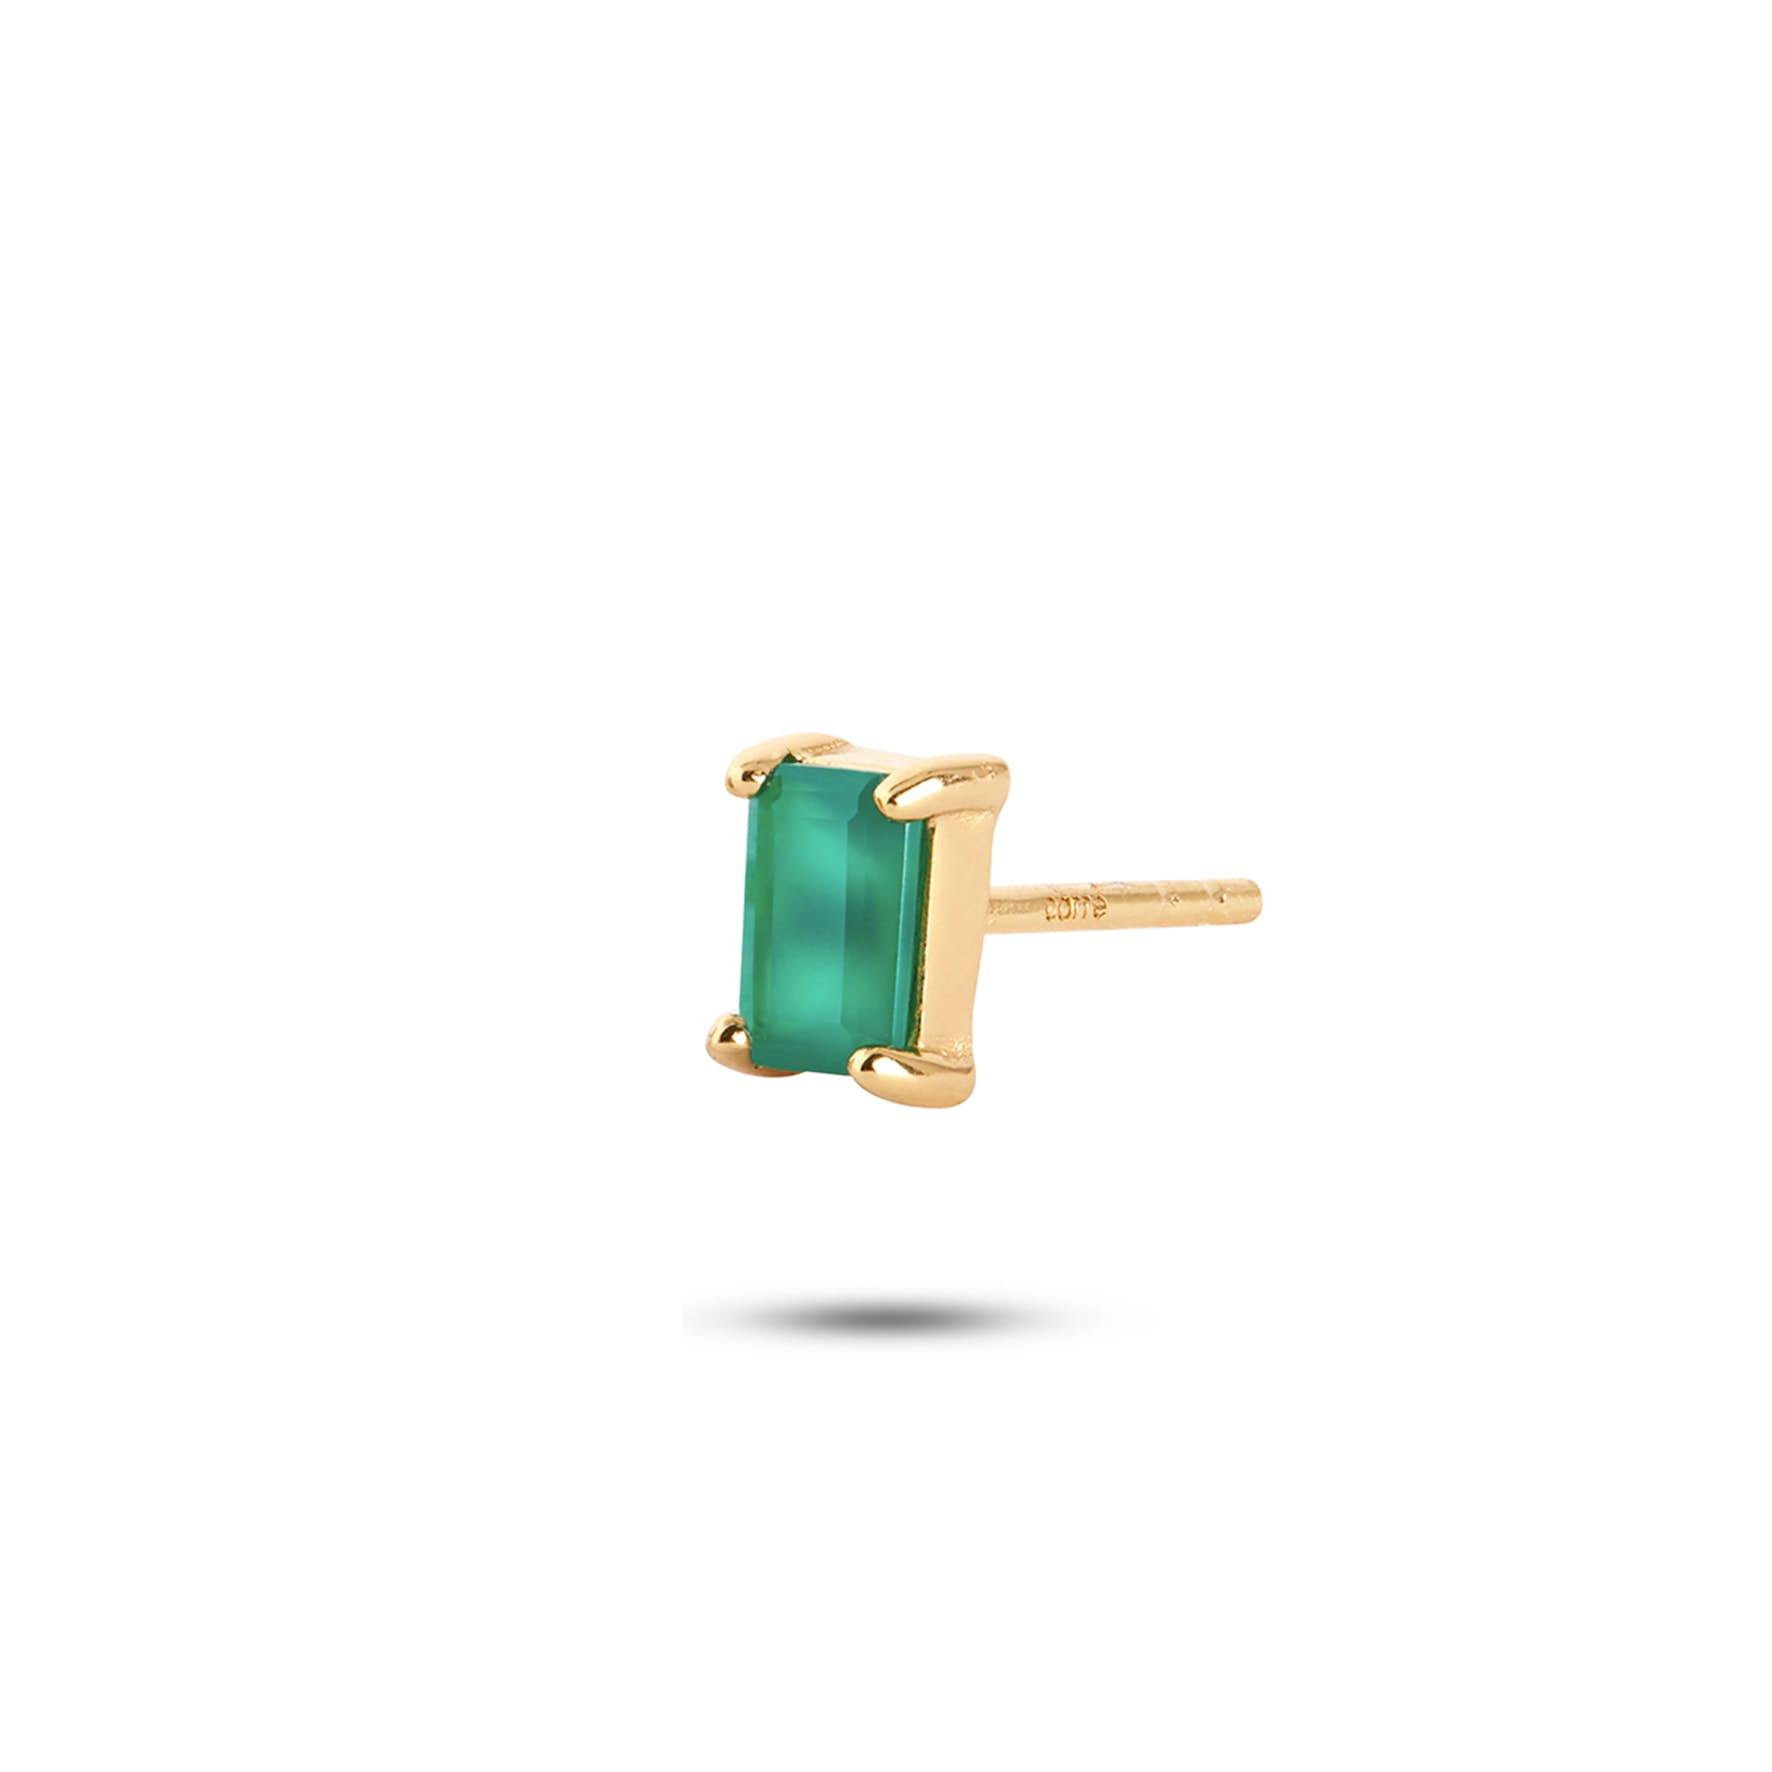 Gem Candy Earstick Confidence fra Carré i Forgyldt-Sølv Sterling 925|Green Agat|Blank